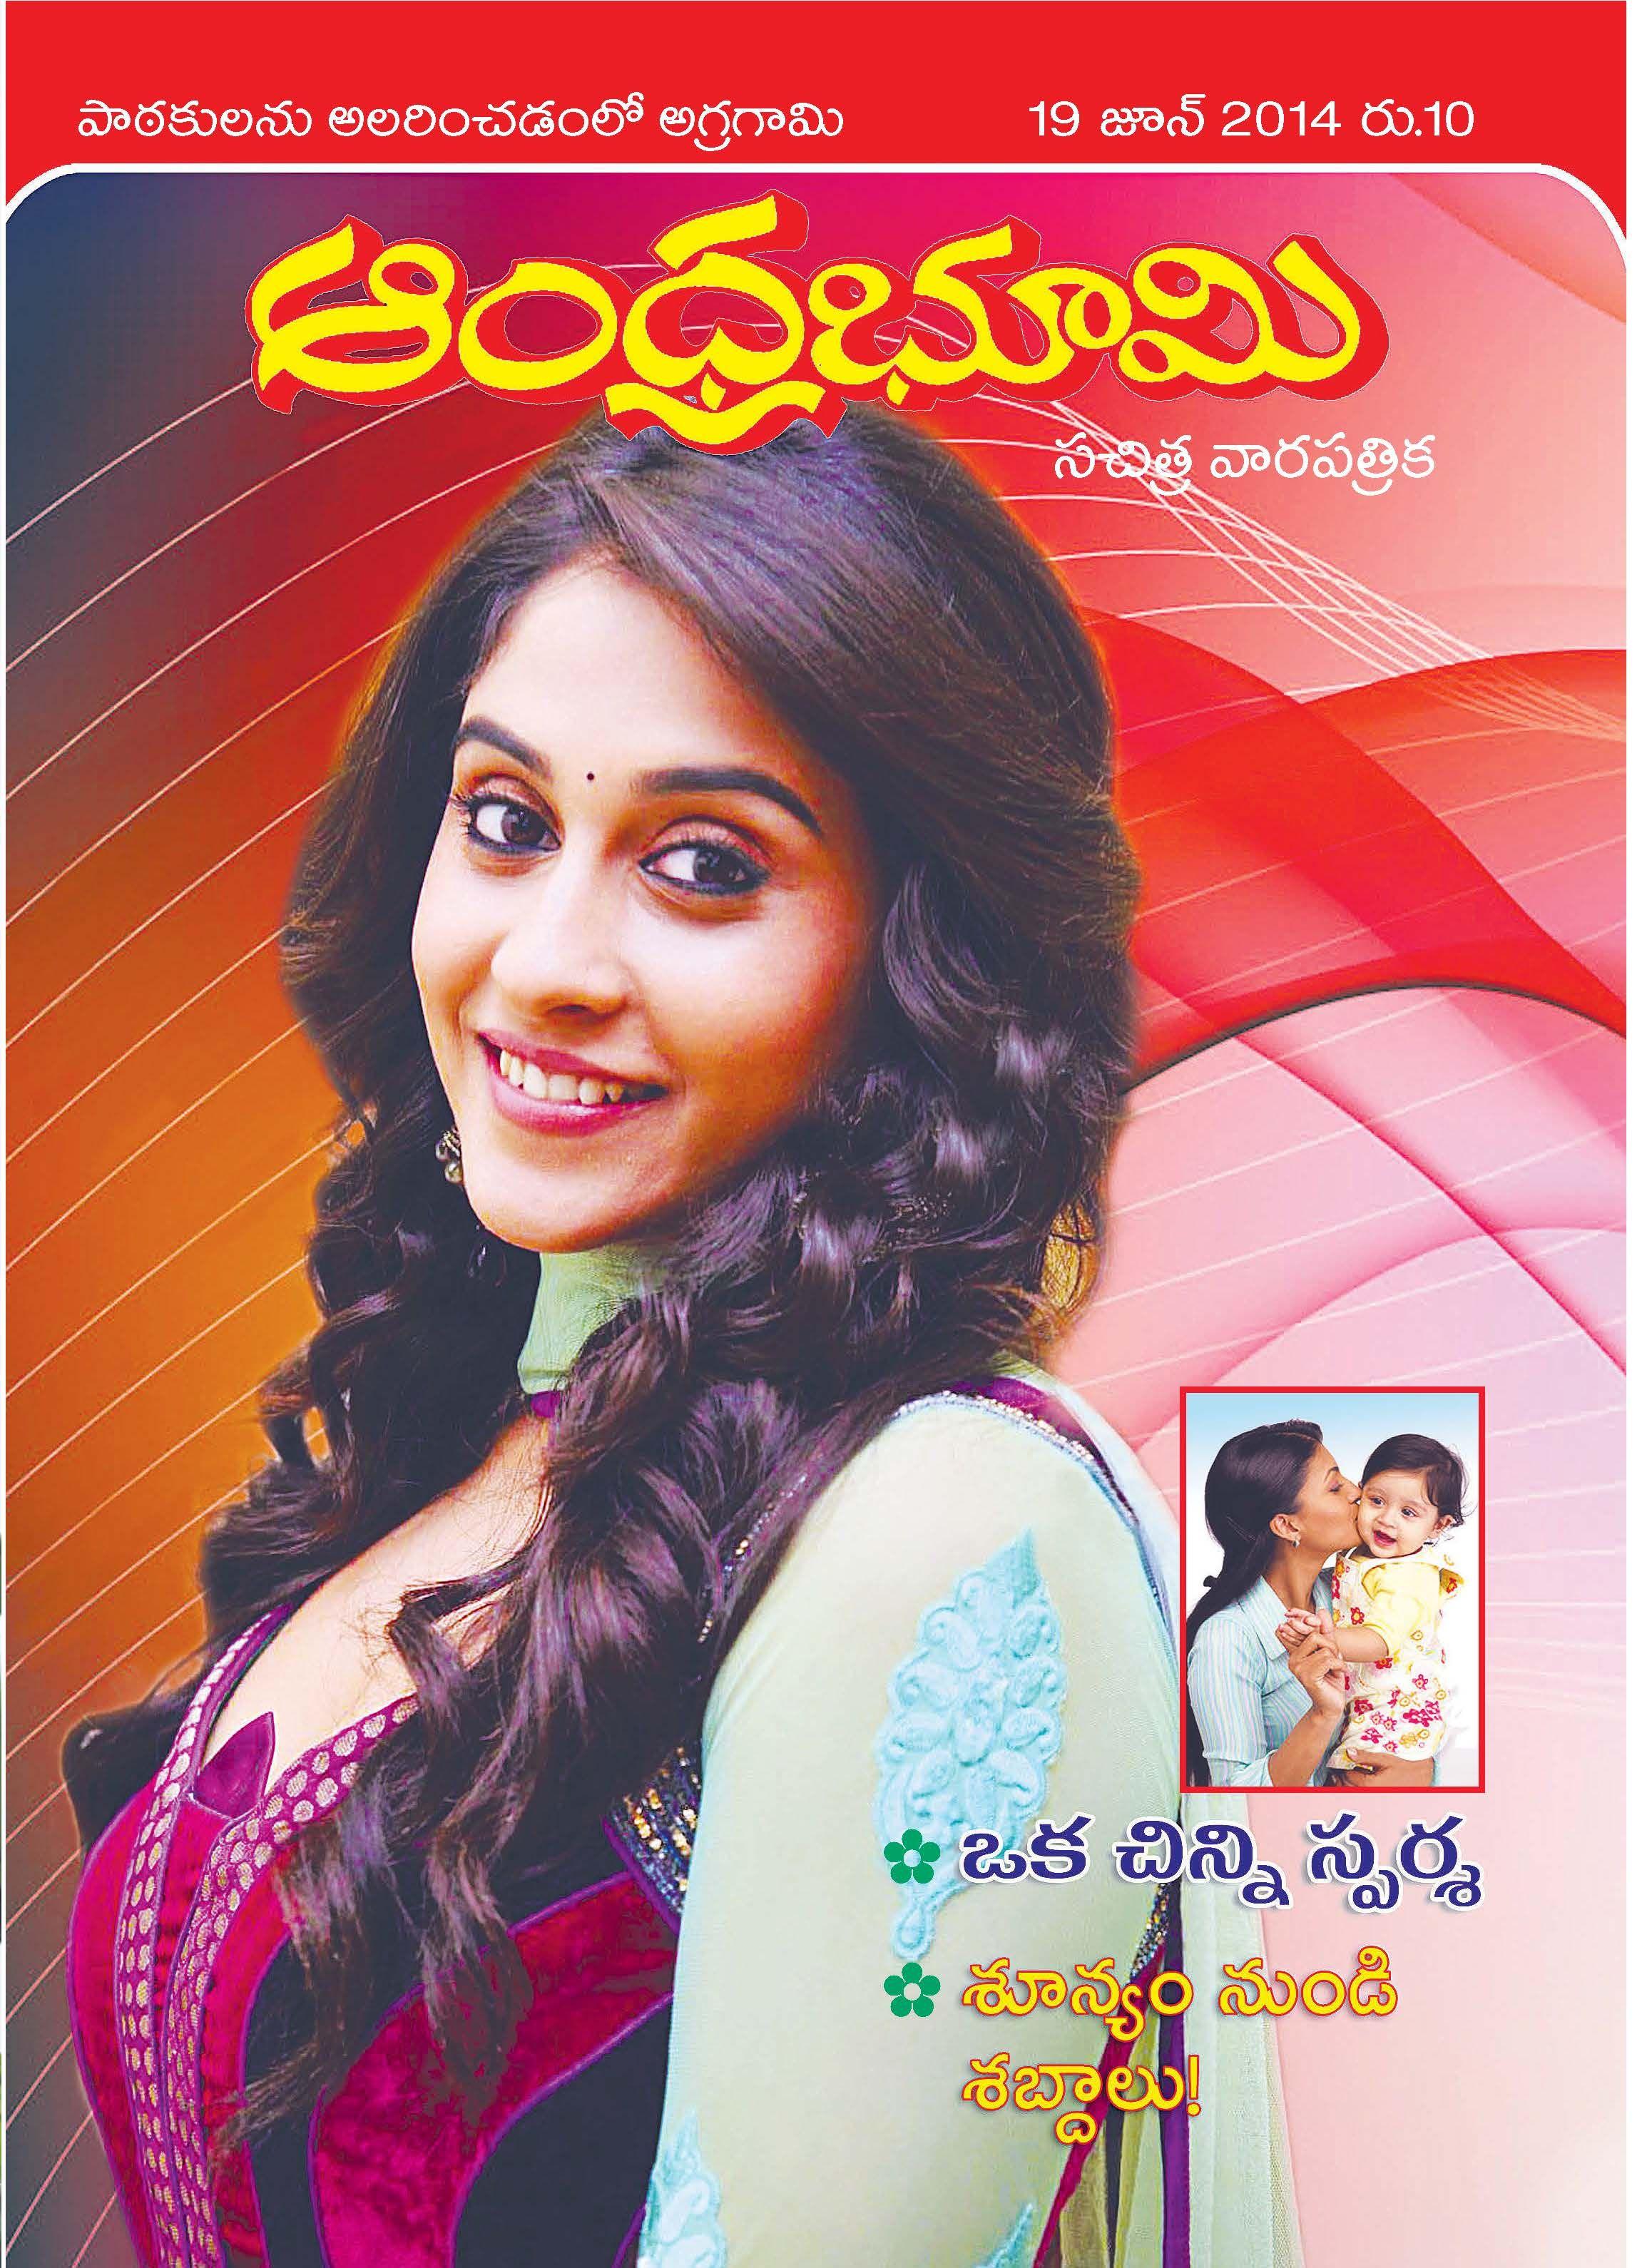 Andhra Bhoomi Weekly Telugu Magazine - Buy, Subscribe